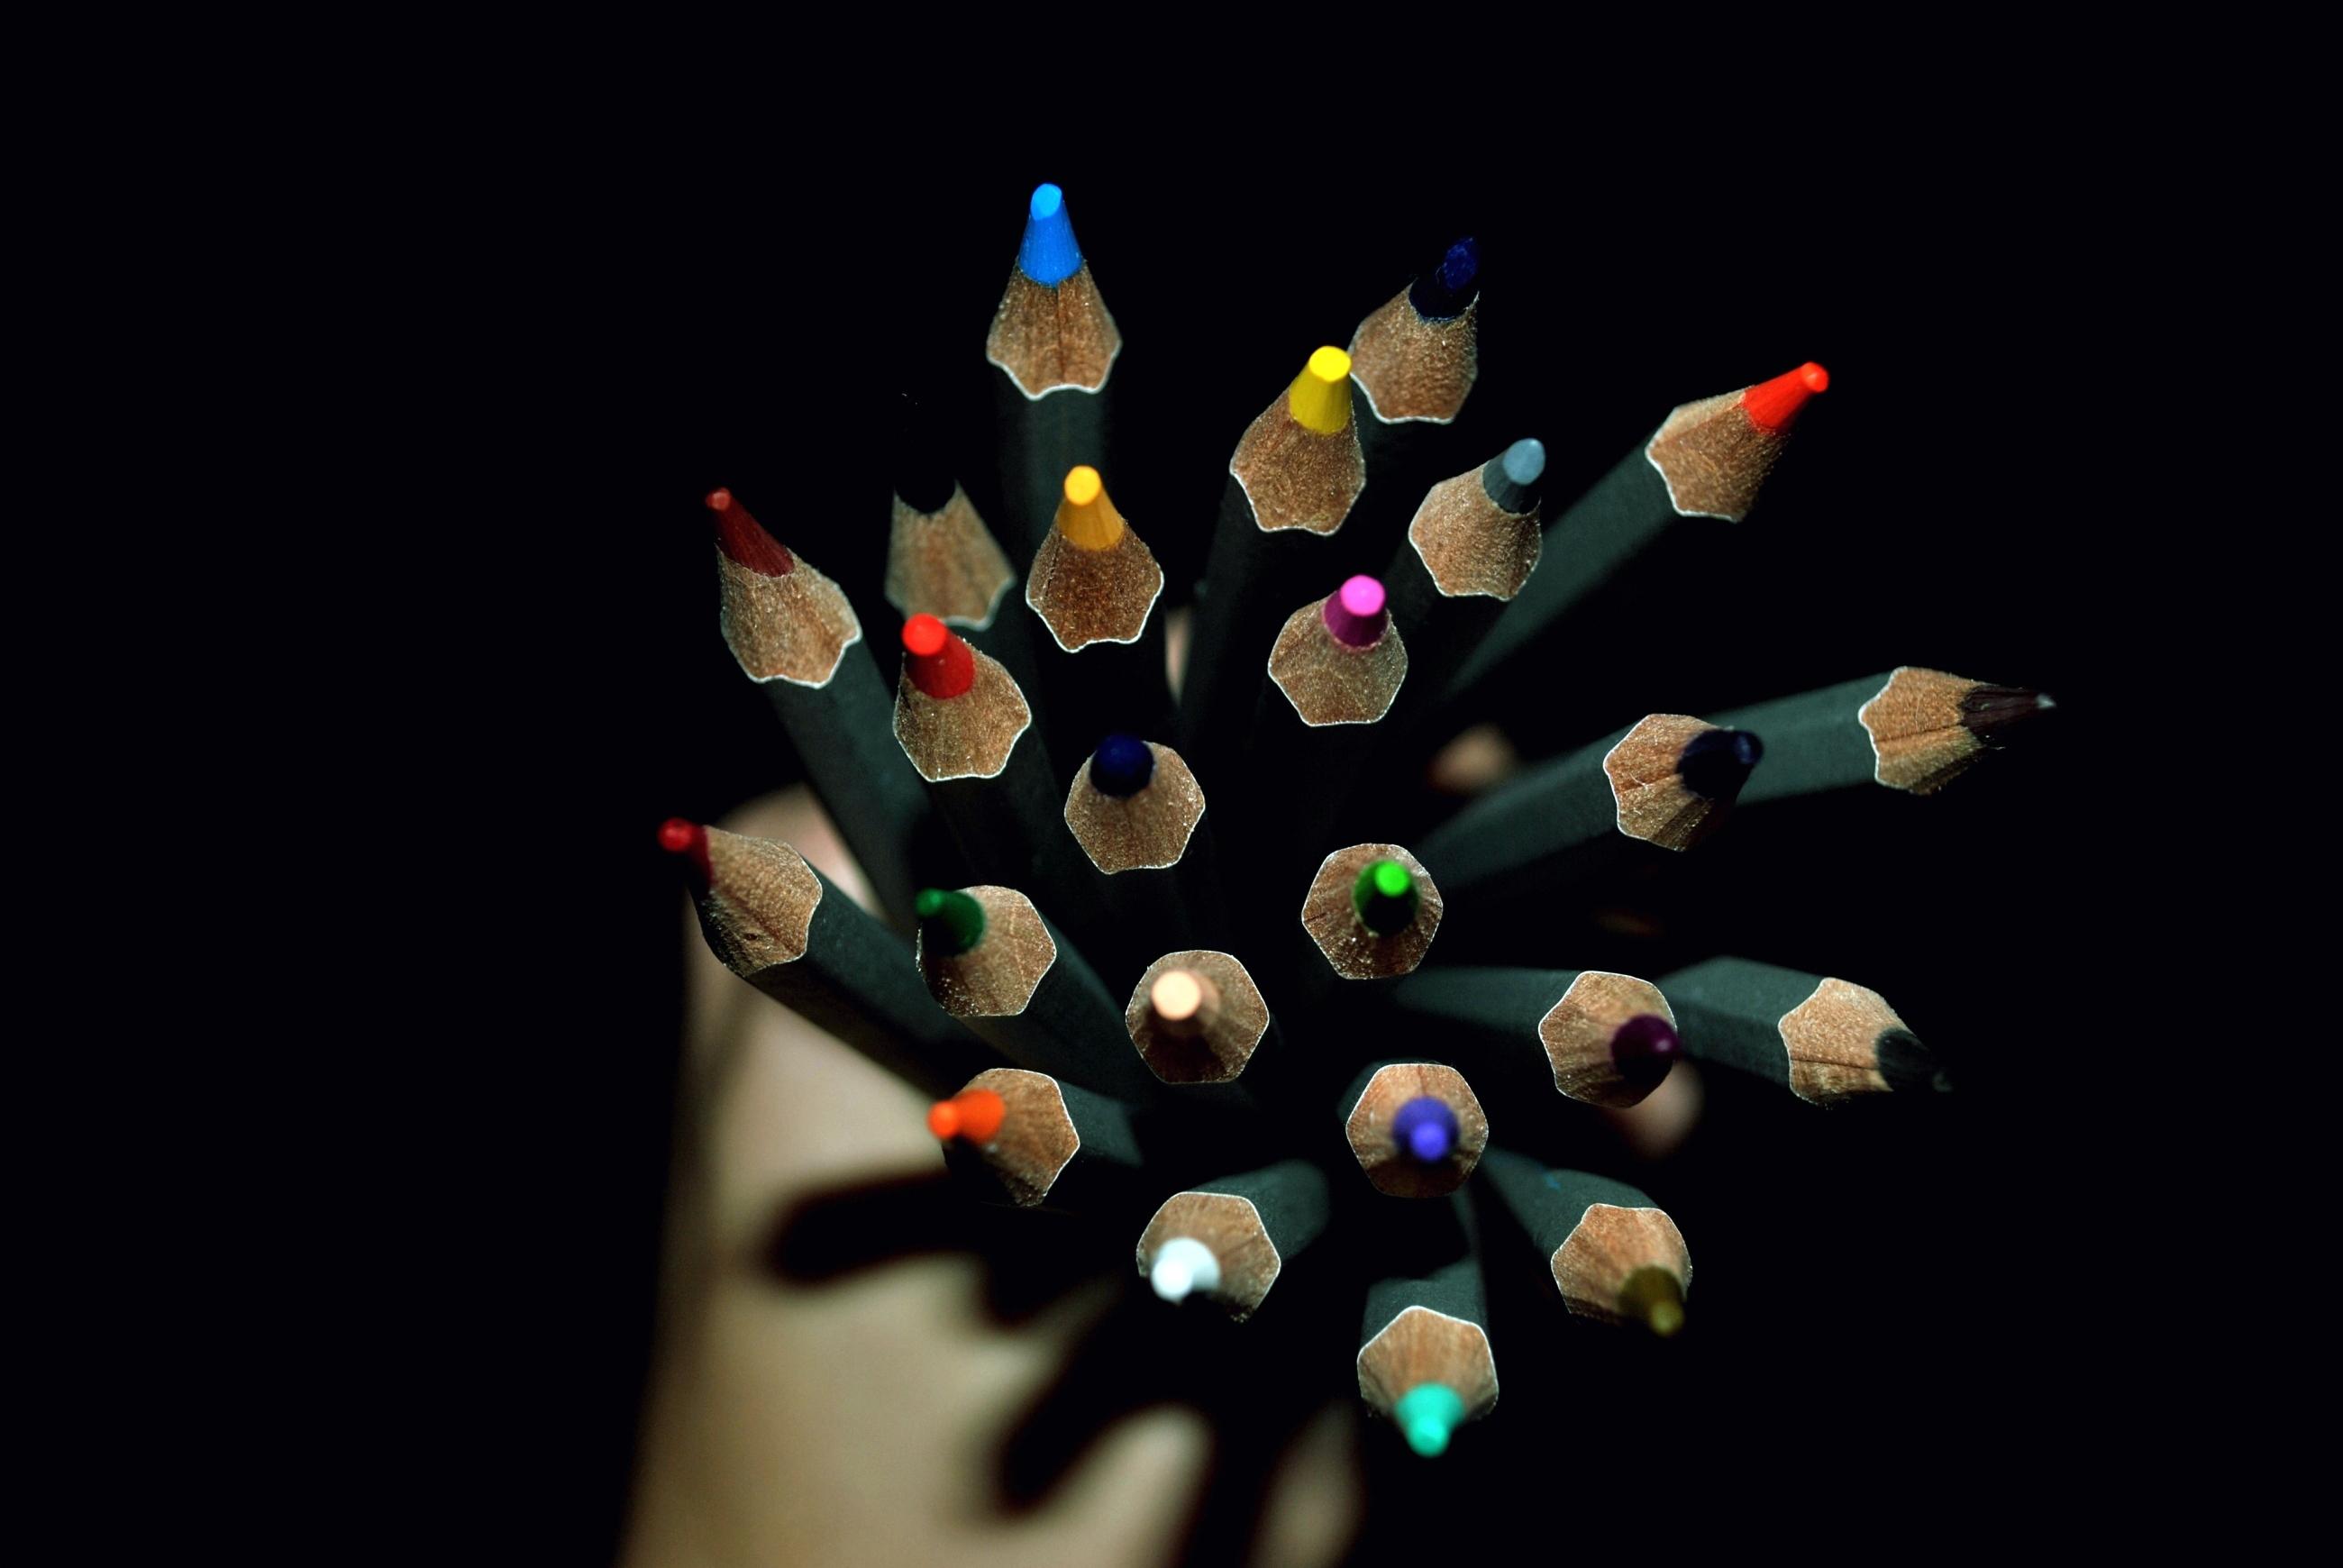 Photography Pencil 2600x1740